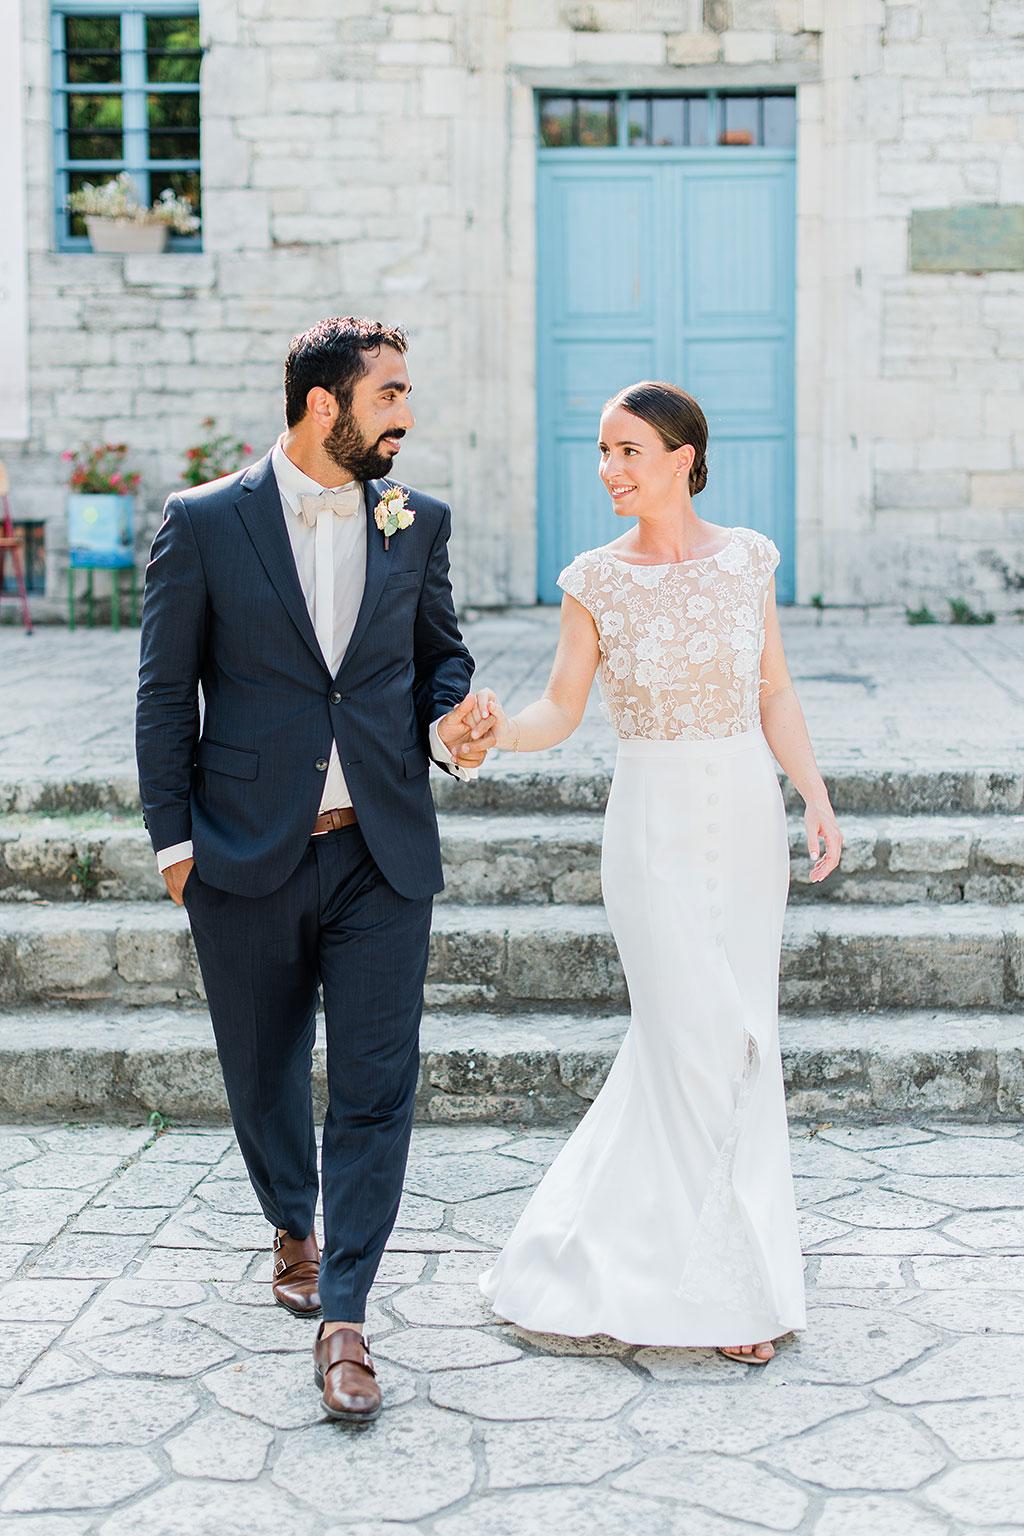 Post wedding photoshoot with this lovely, Φωτογράφος γάμου Χαλκιδική